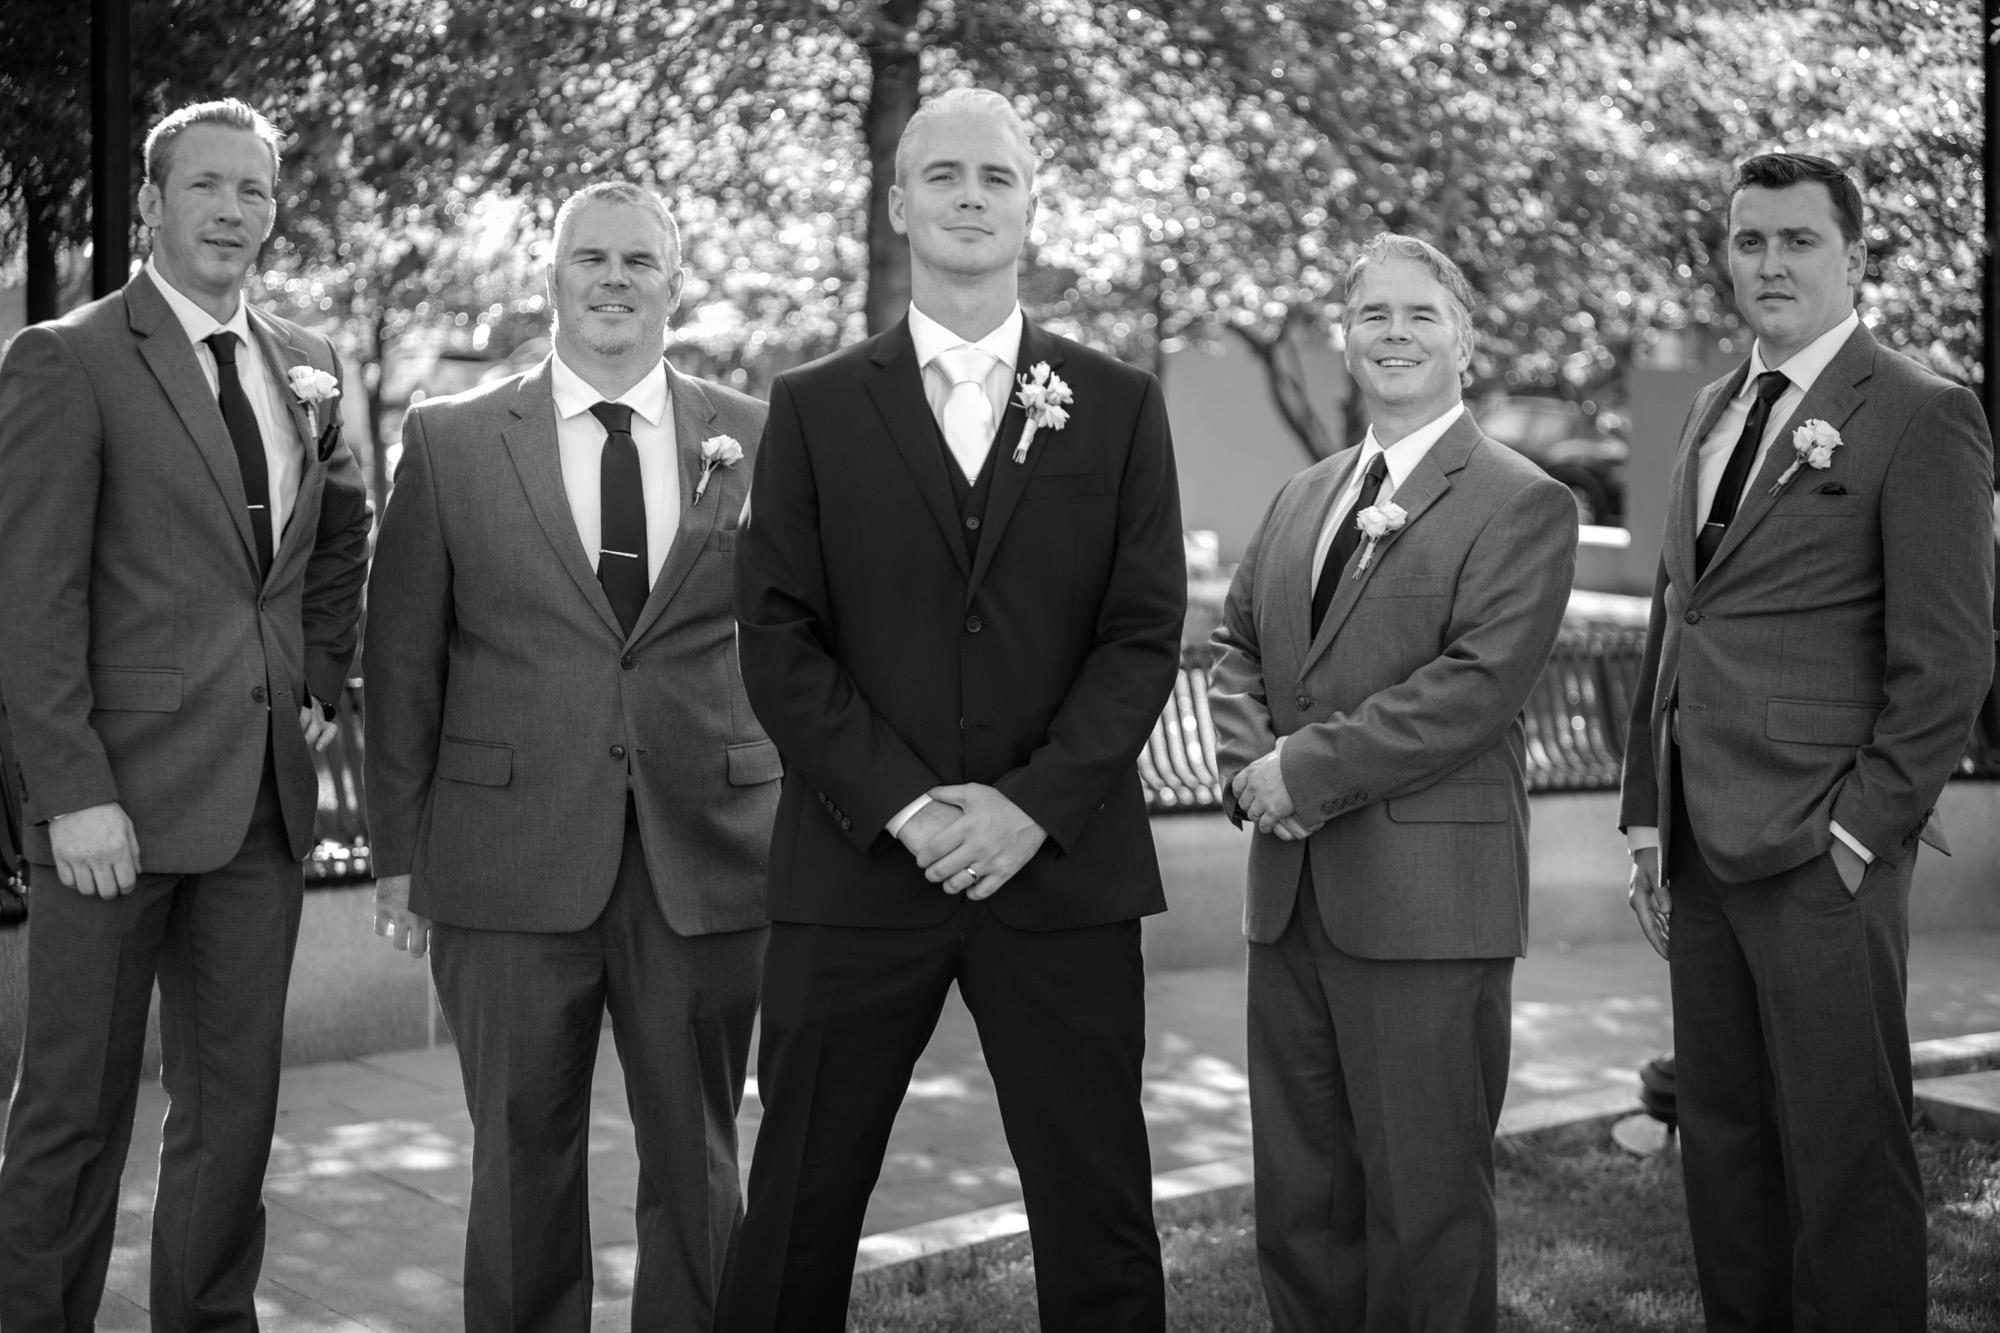 scranton_wedding_photographer_lettieri_pa (29 of 47).jpg